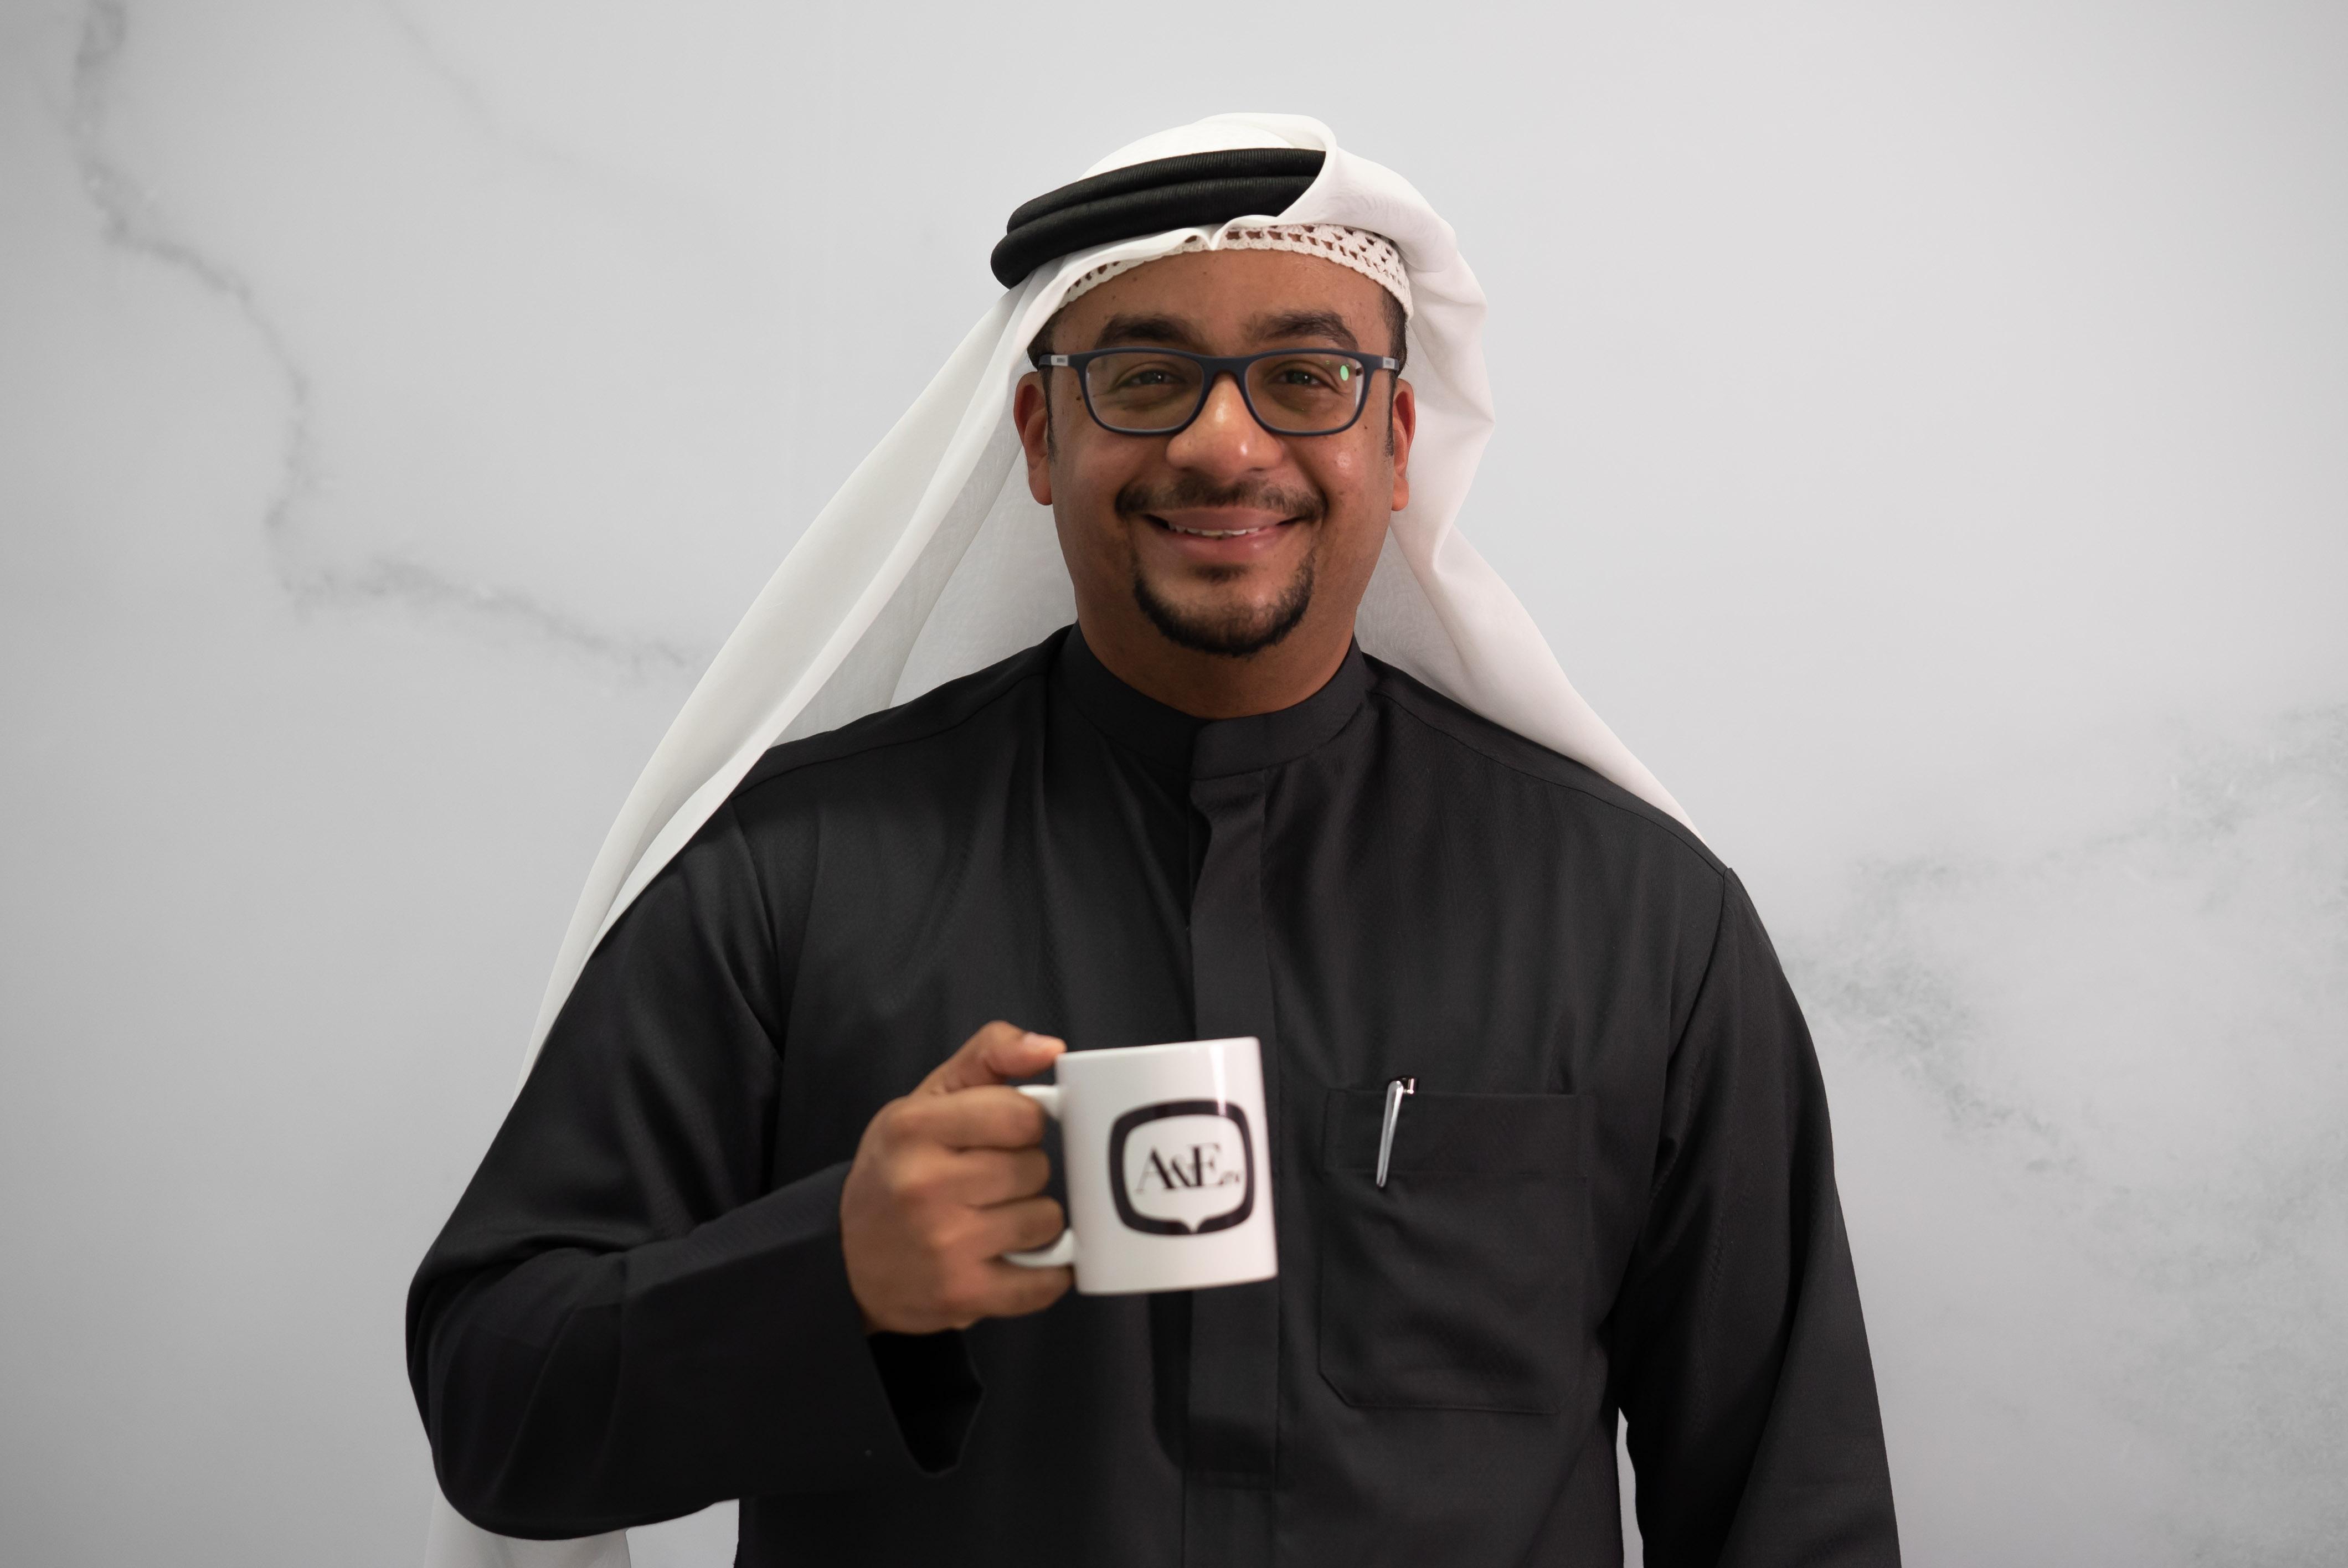 Talib Hashim talks through his career goals and mottos over Morning Coffee